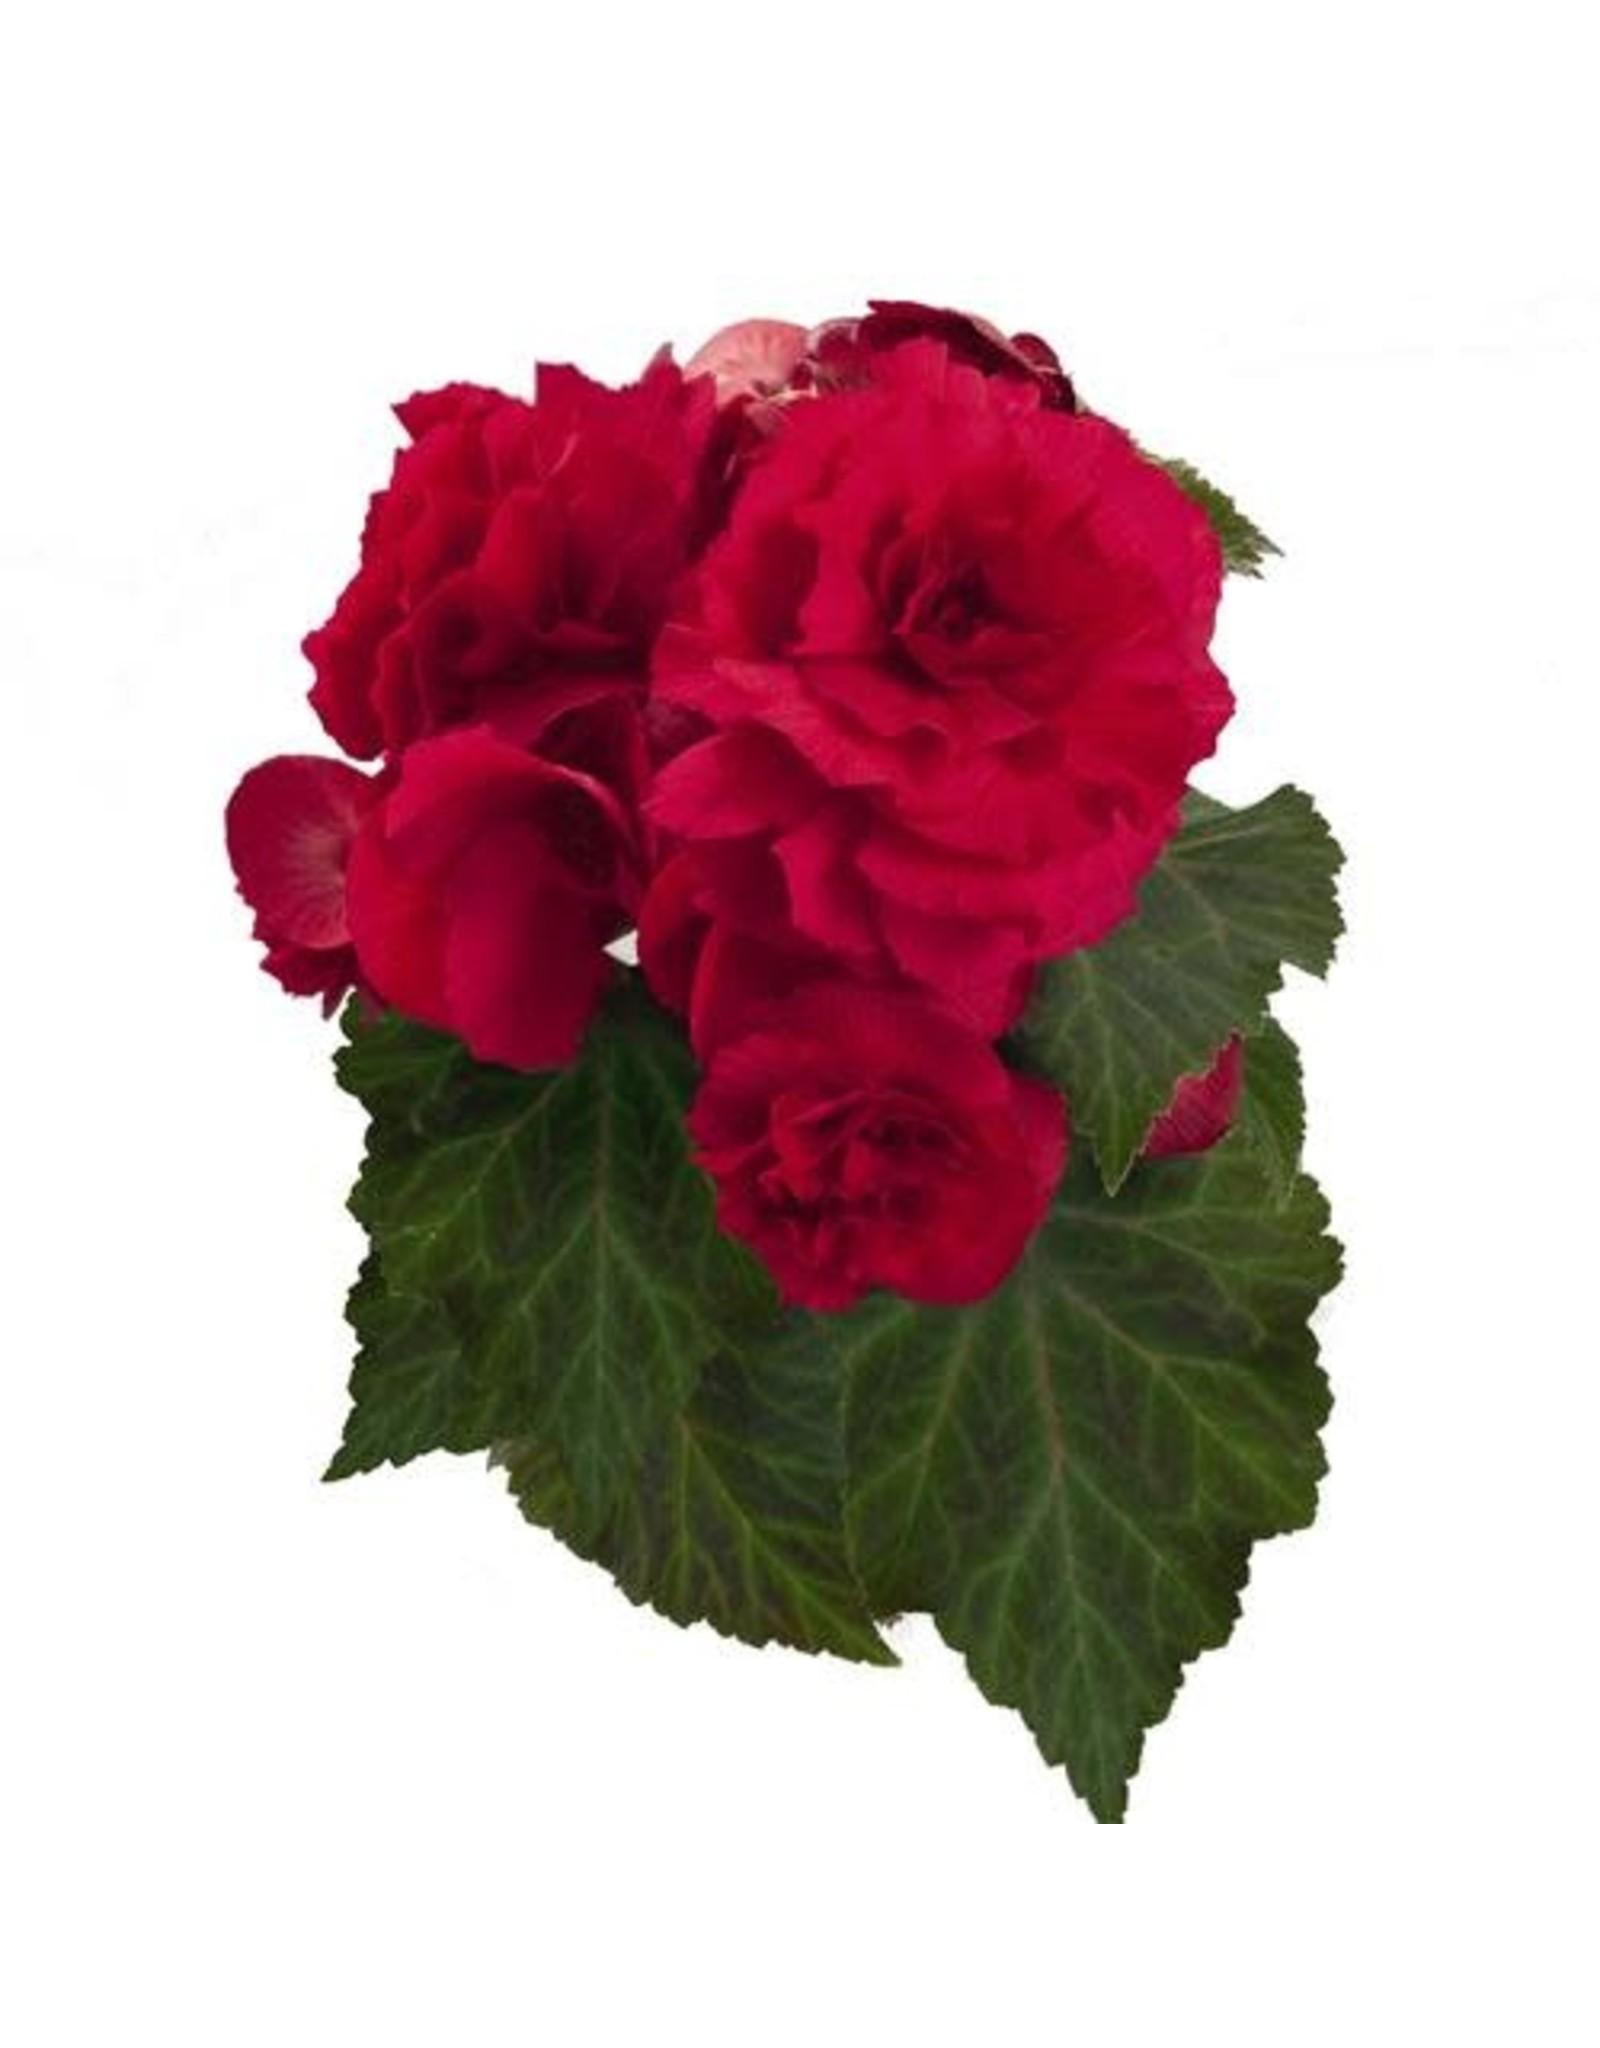 Begonia - Nonstop Deep Rose